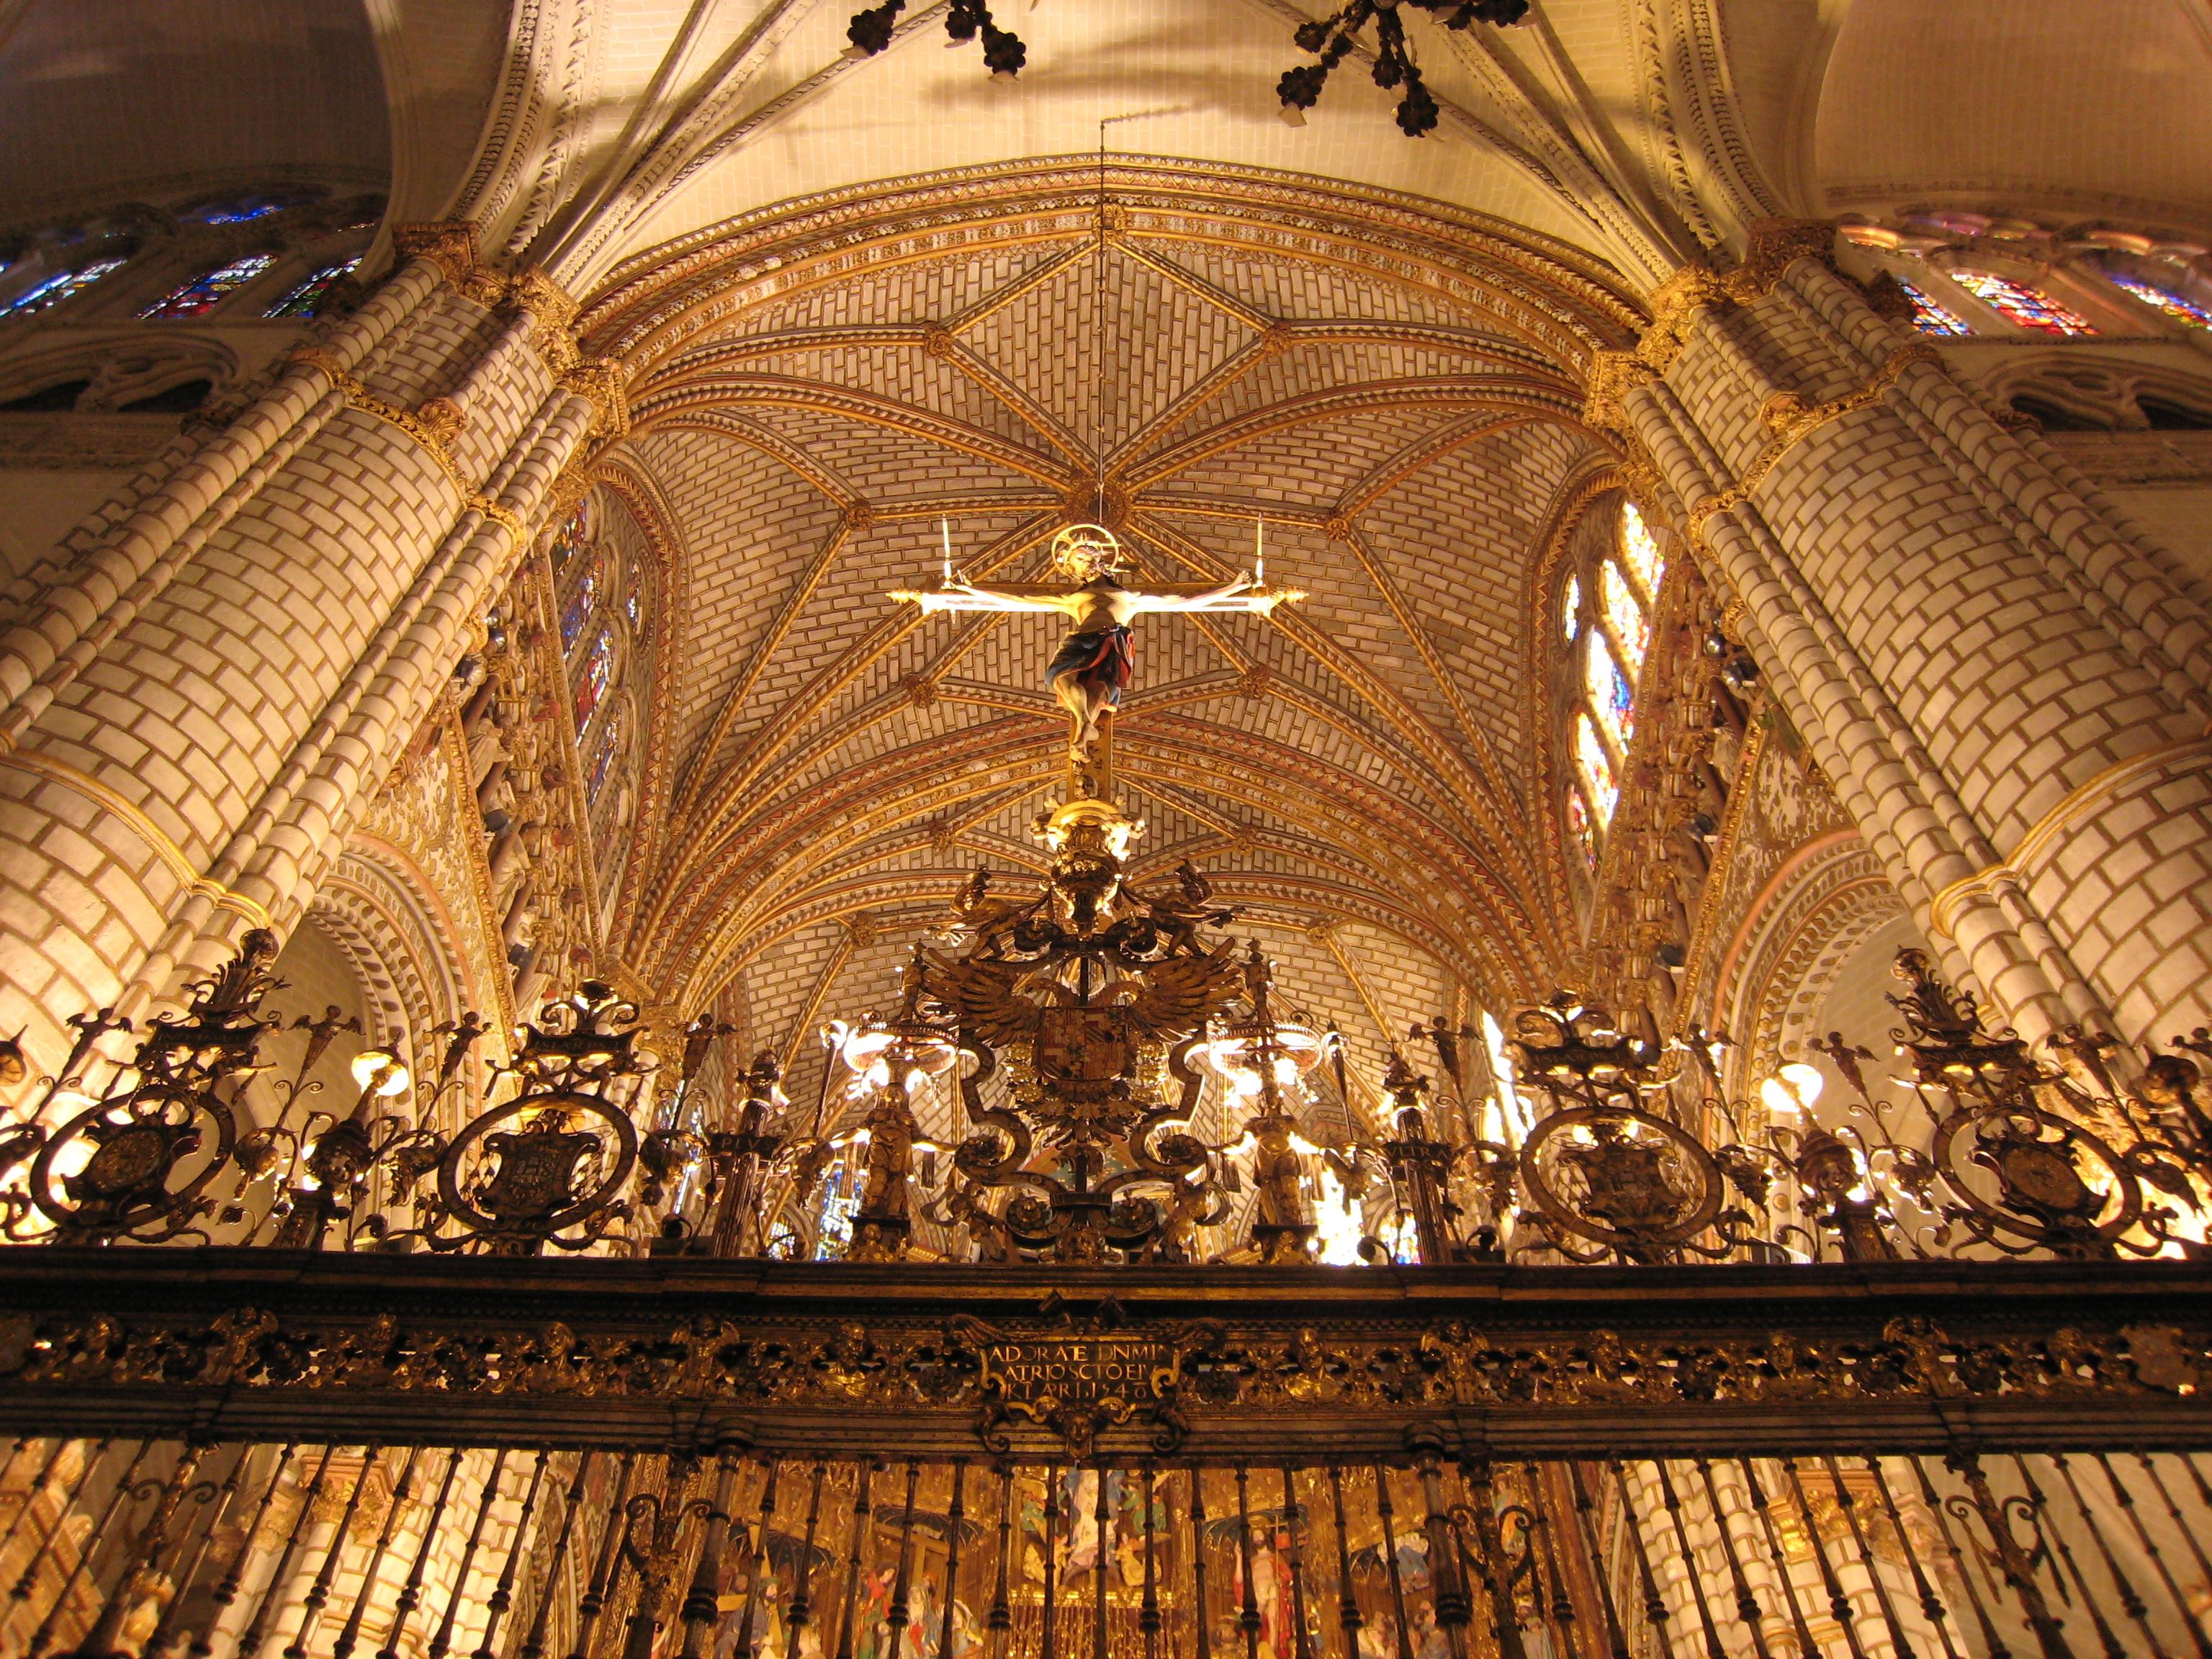 File:Entrada a la capilla mayor.jpg - Wikimedia Commons